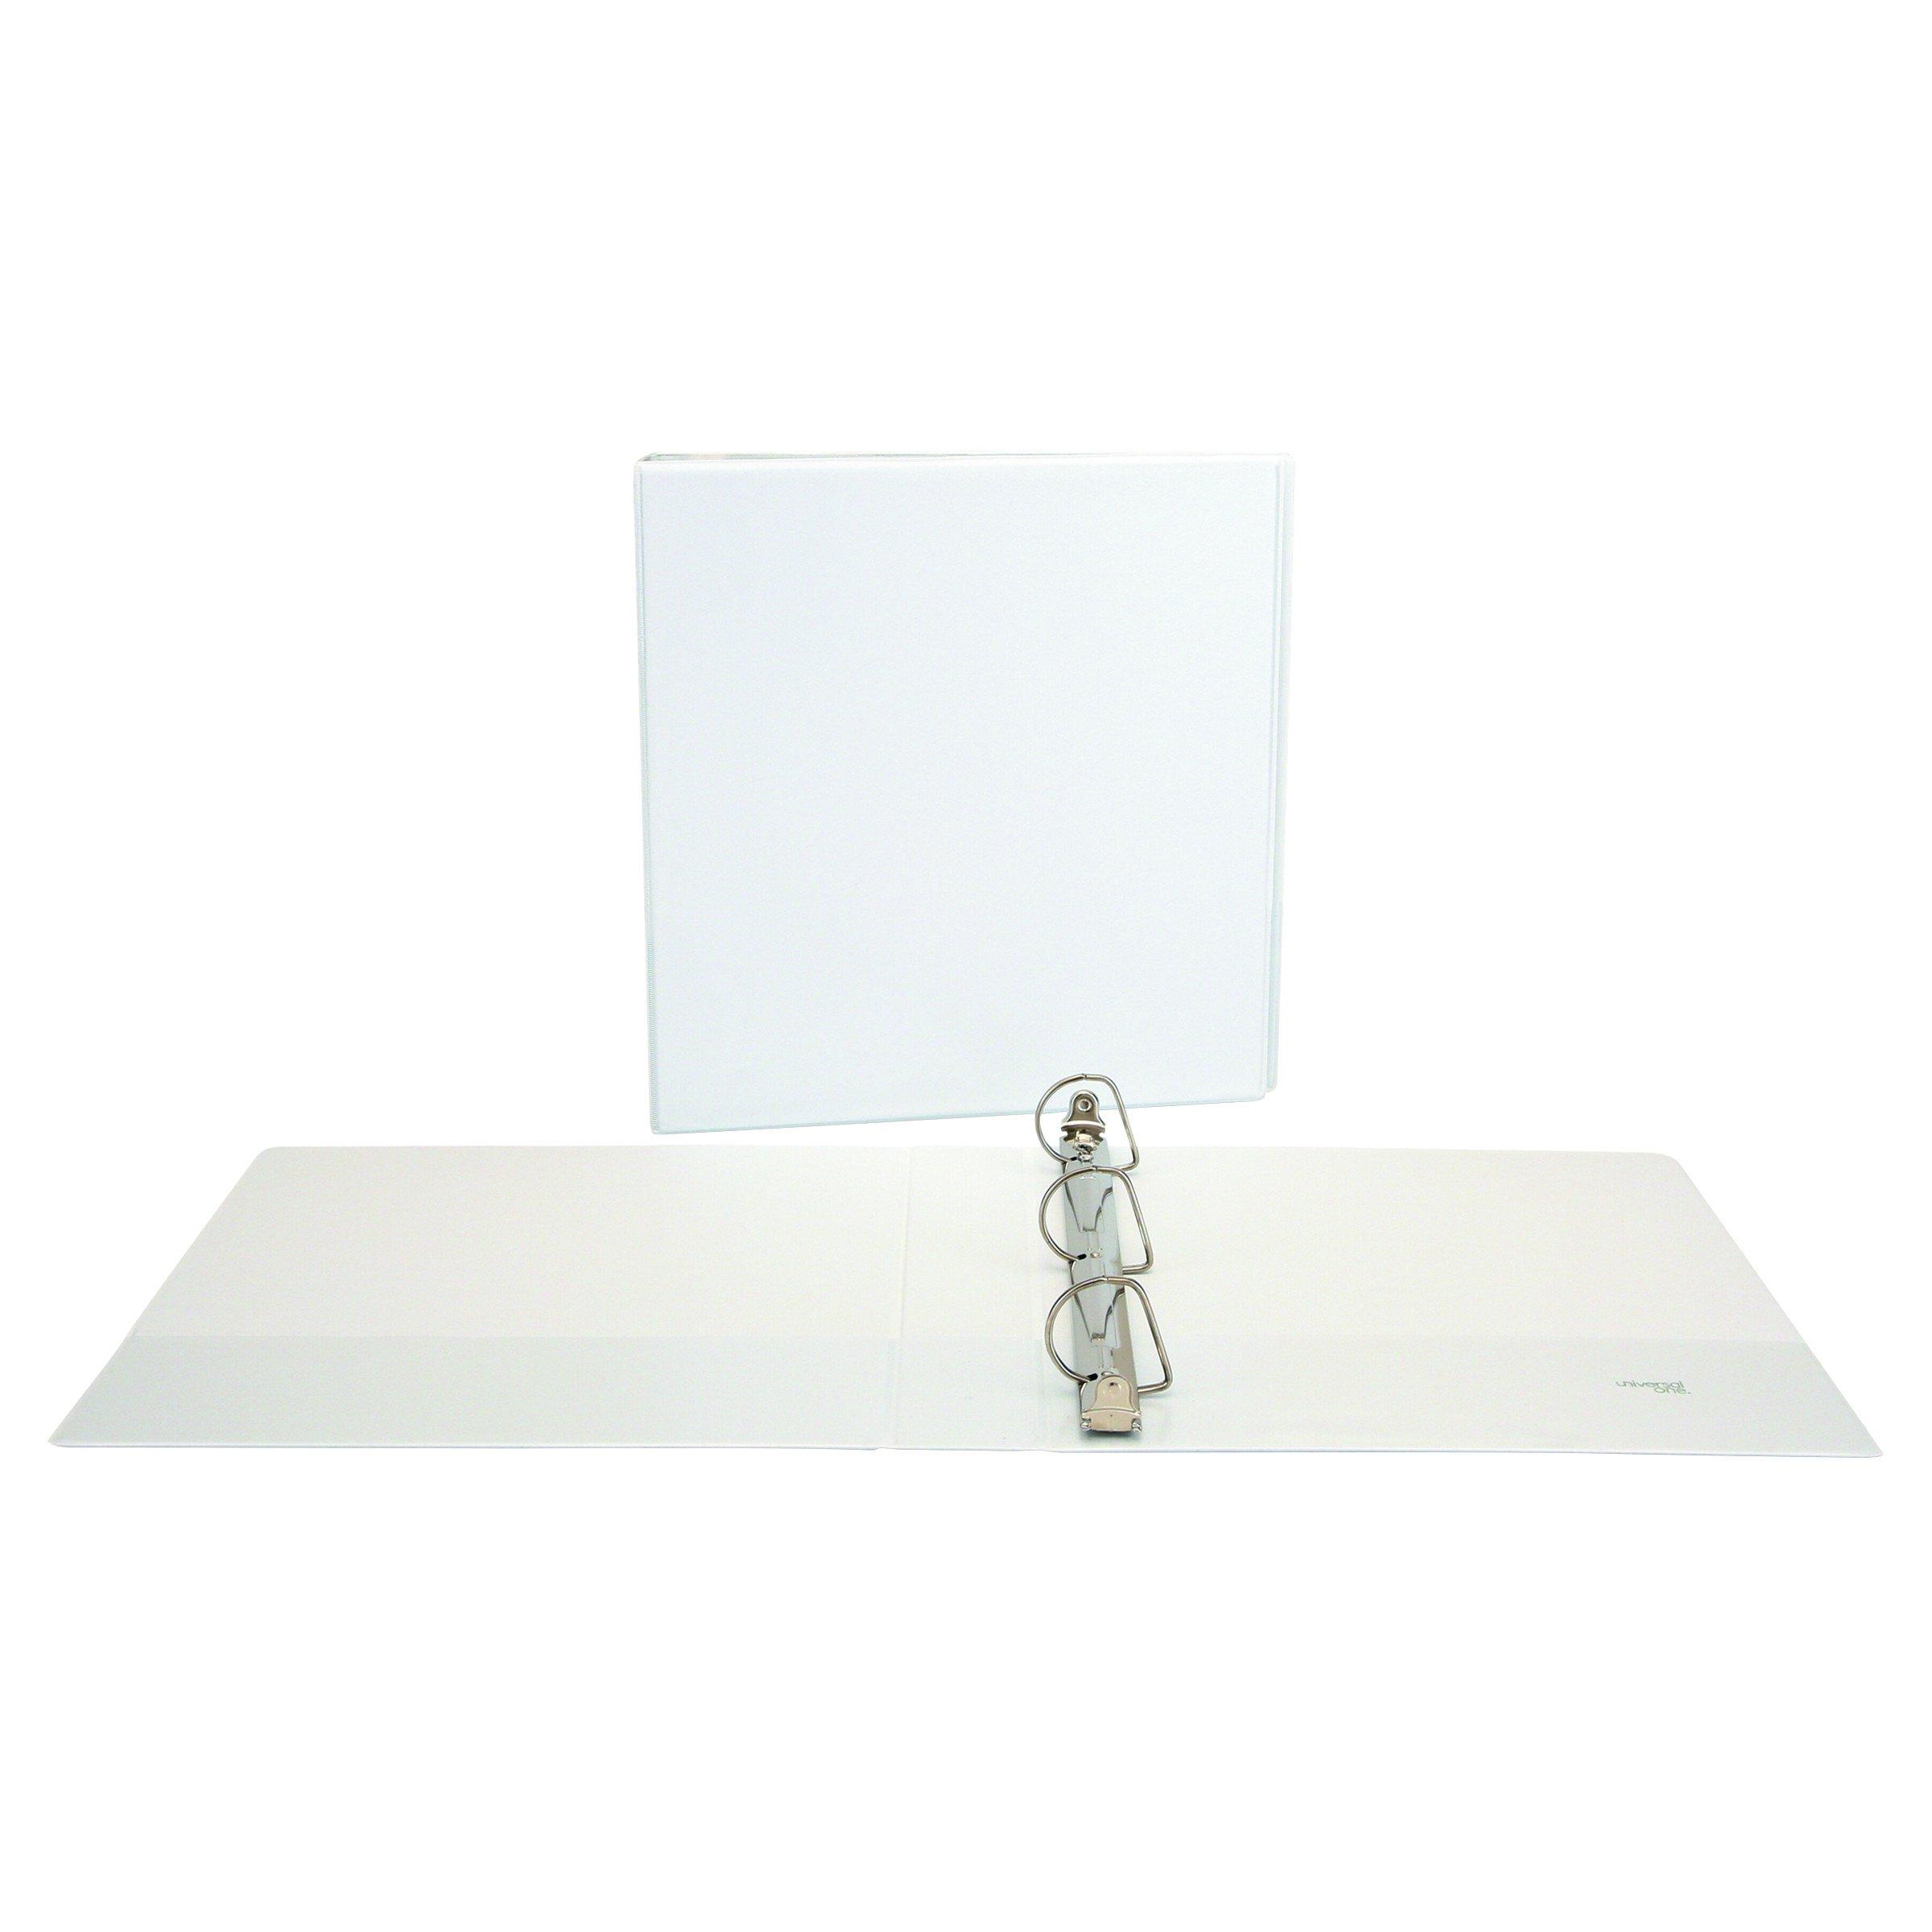 Universal 20744PK Slant-Ring Economy View Binder, 1-1/2'' Capacity, White (Pack of 4)